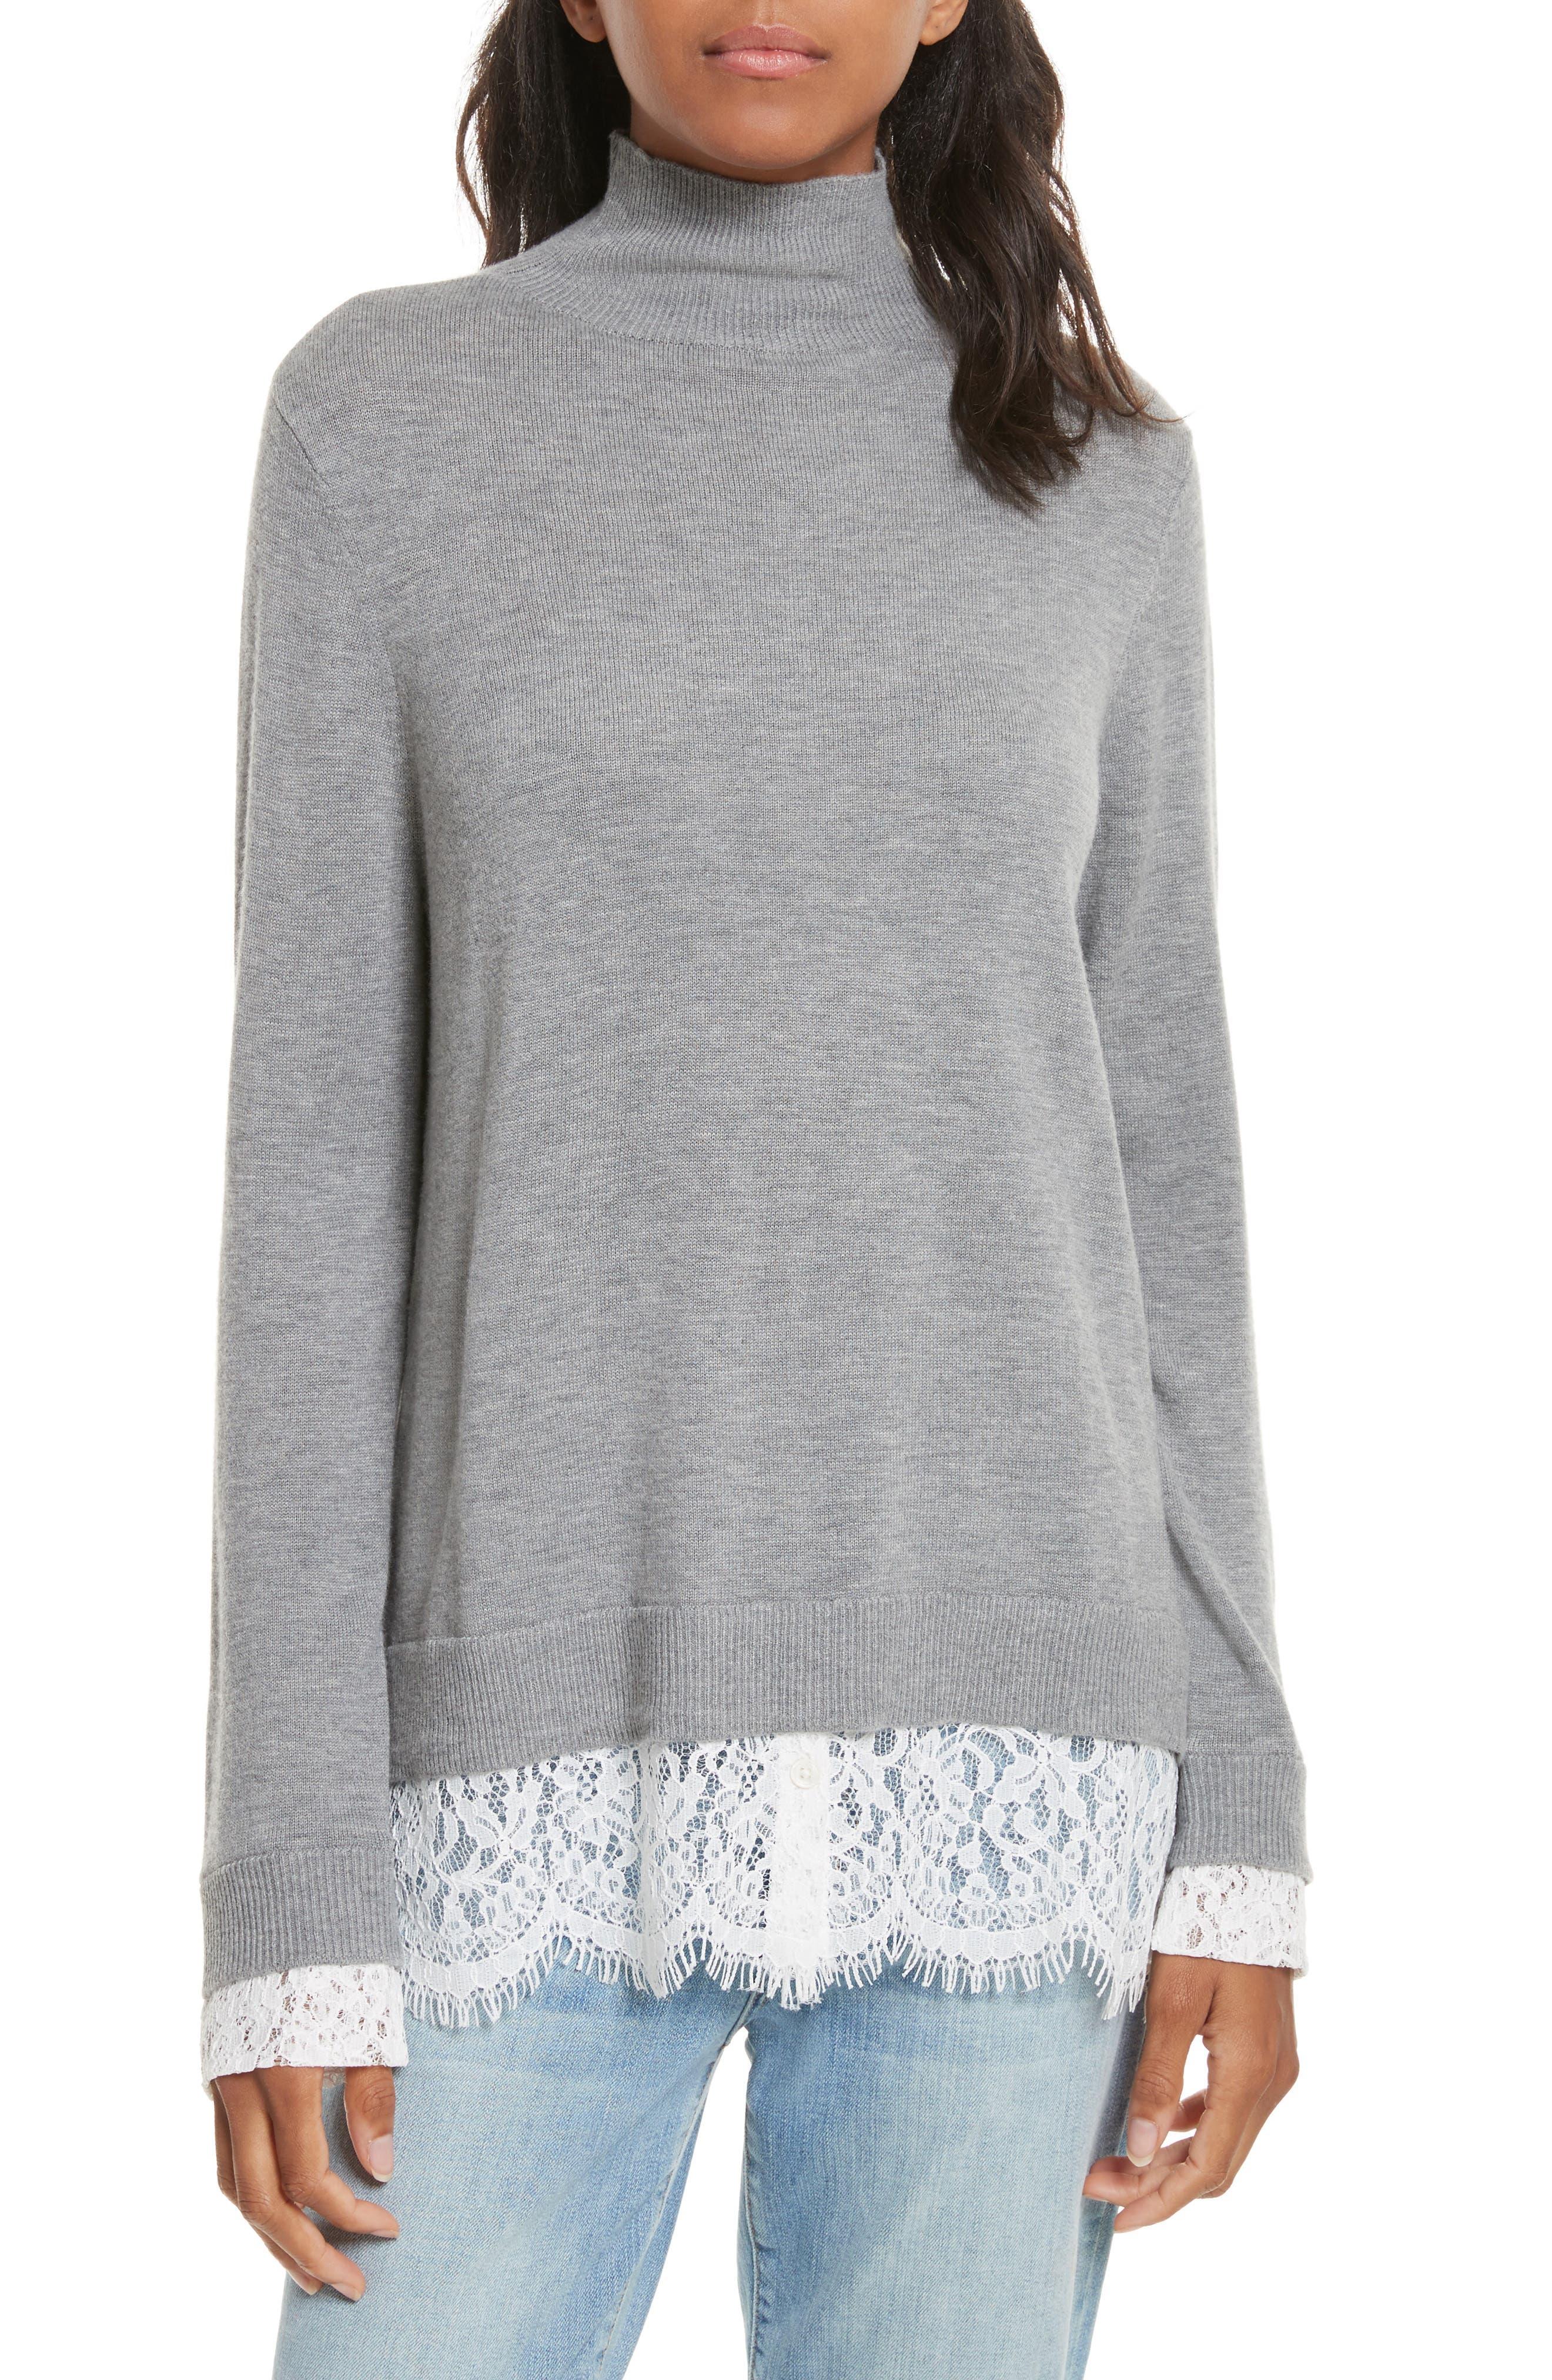 Joie Fredrika Lace Inset Sweater